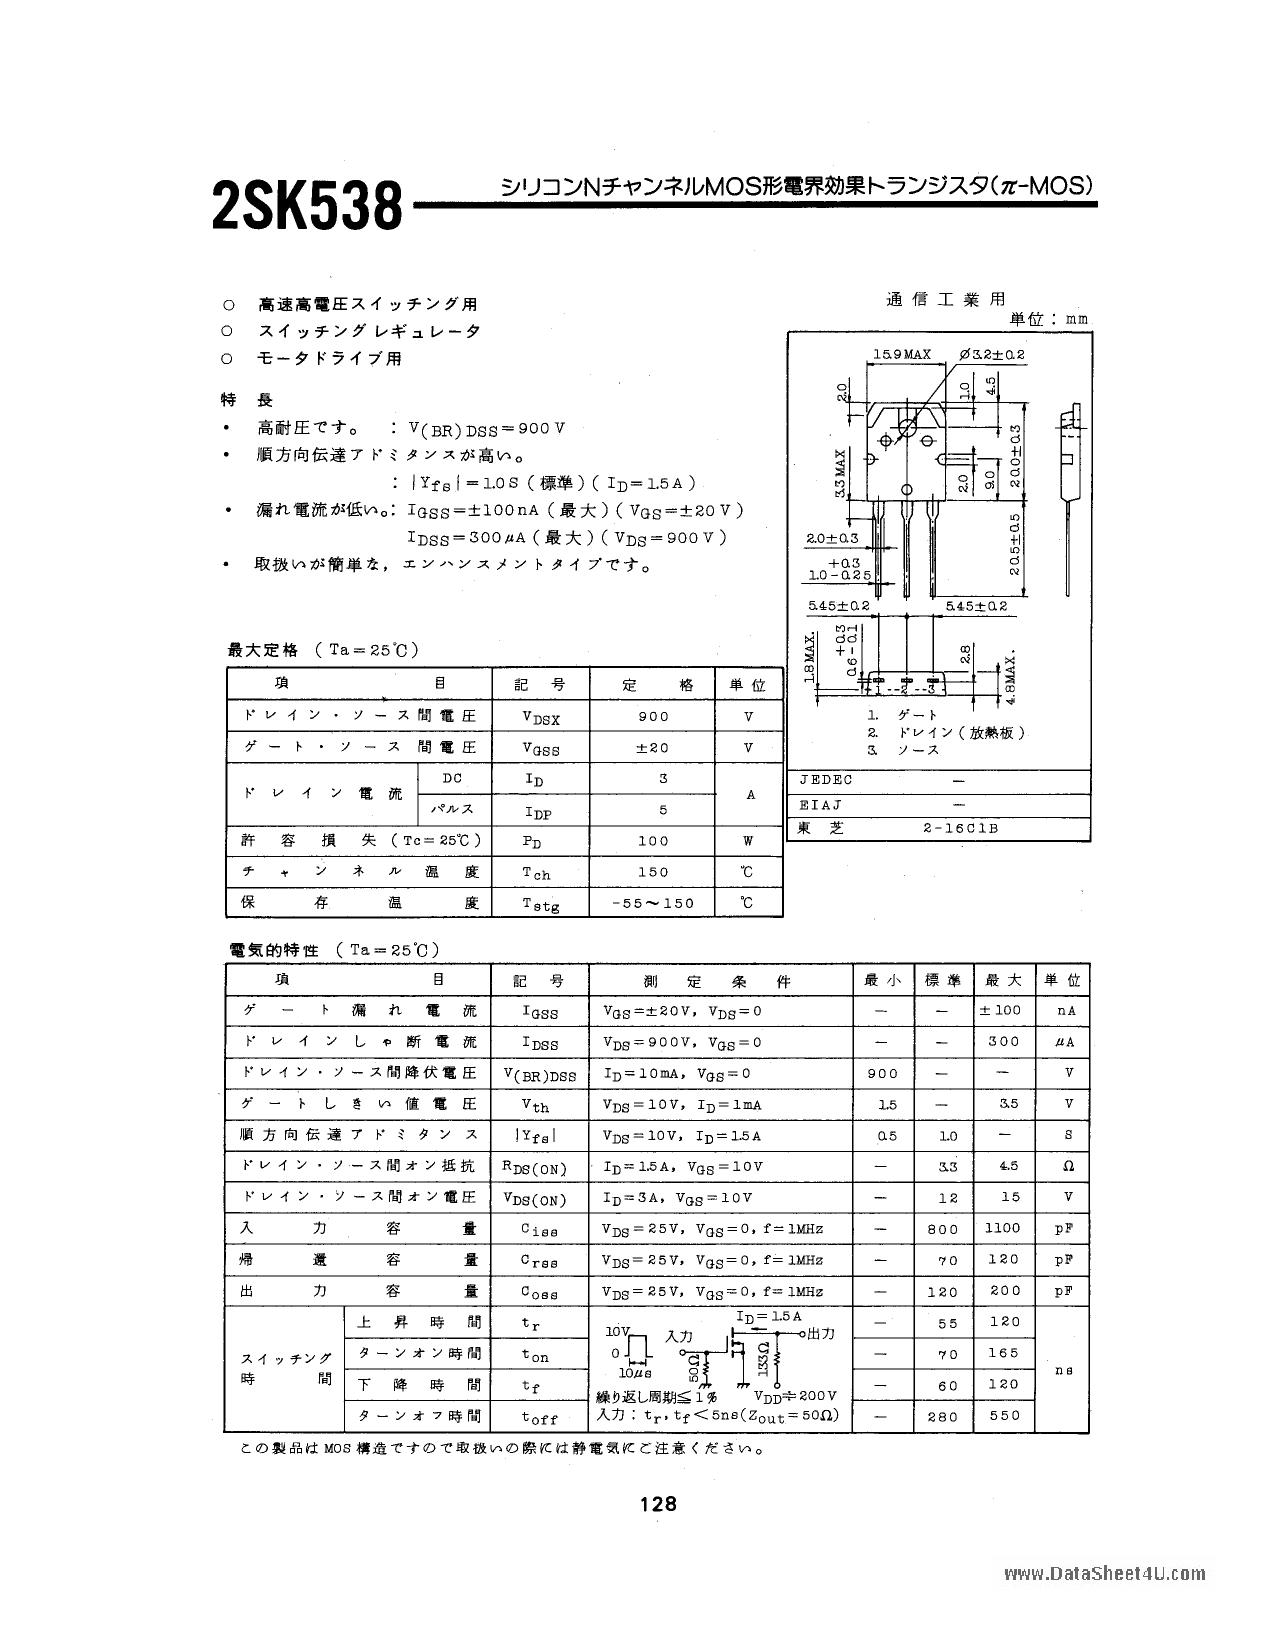 K538 Datenblatt PDF